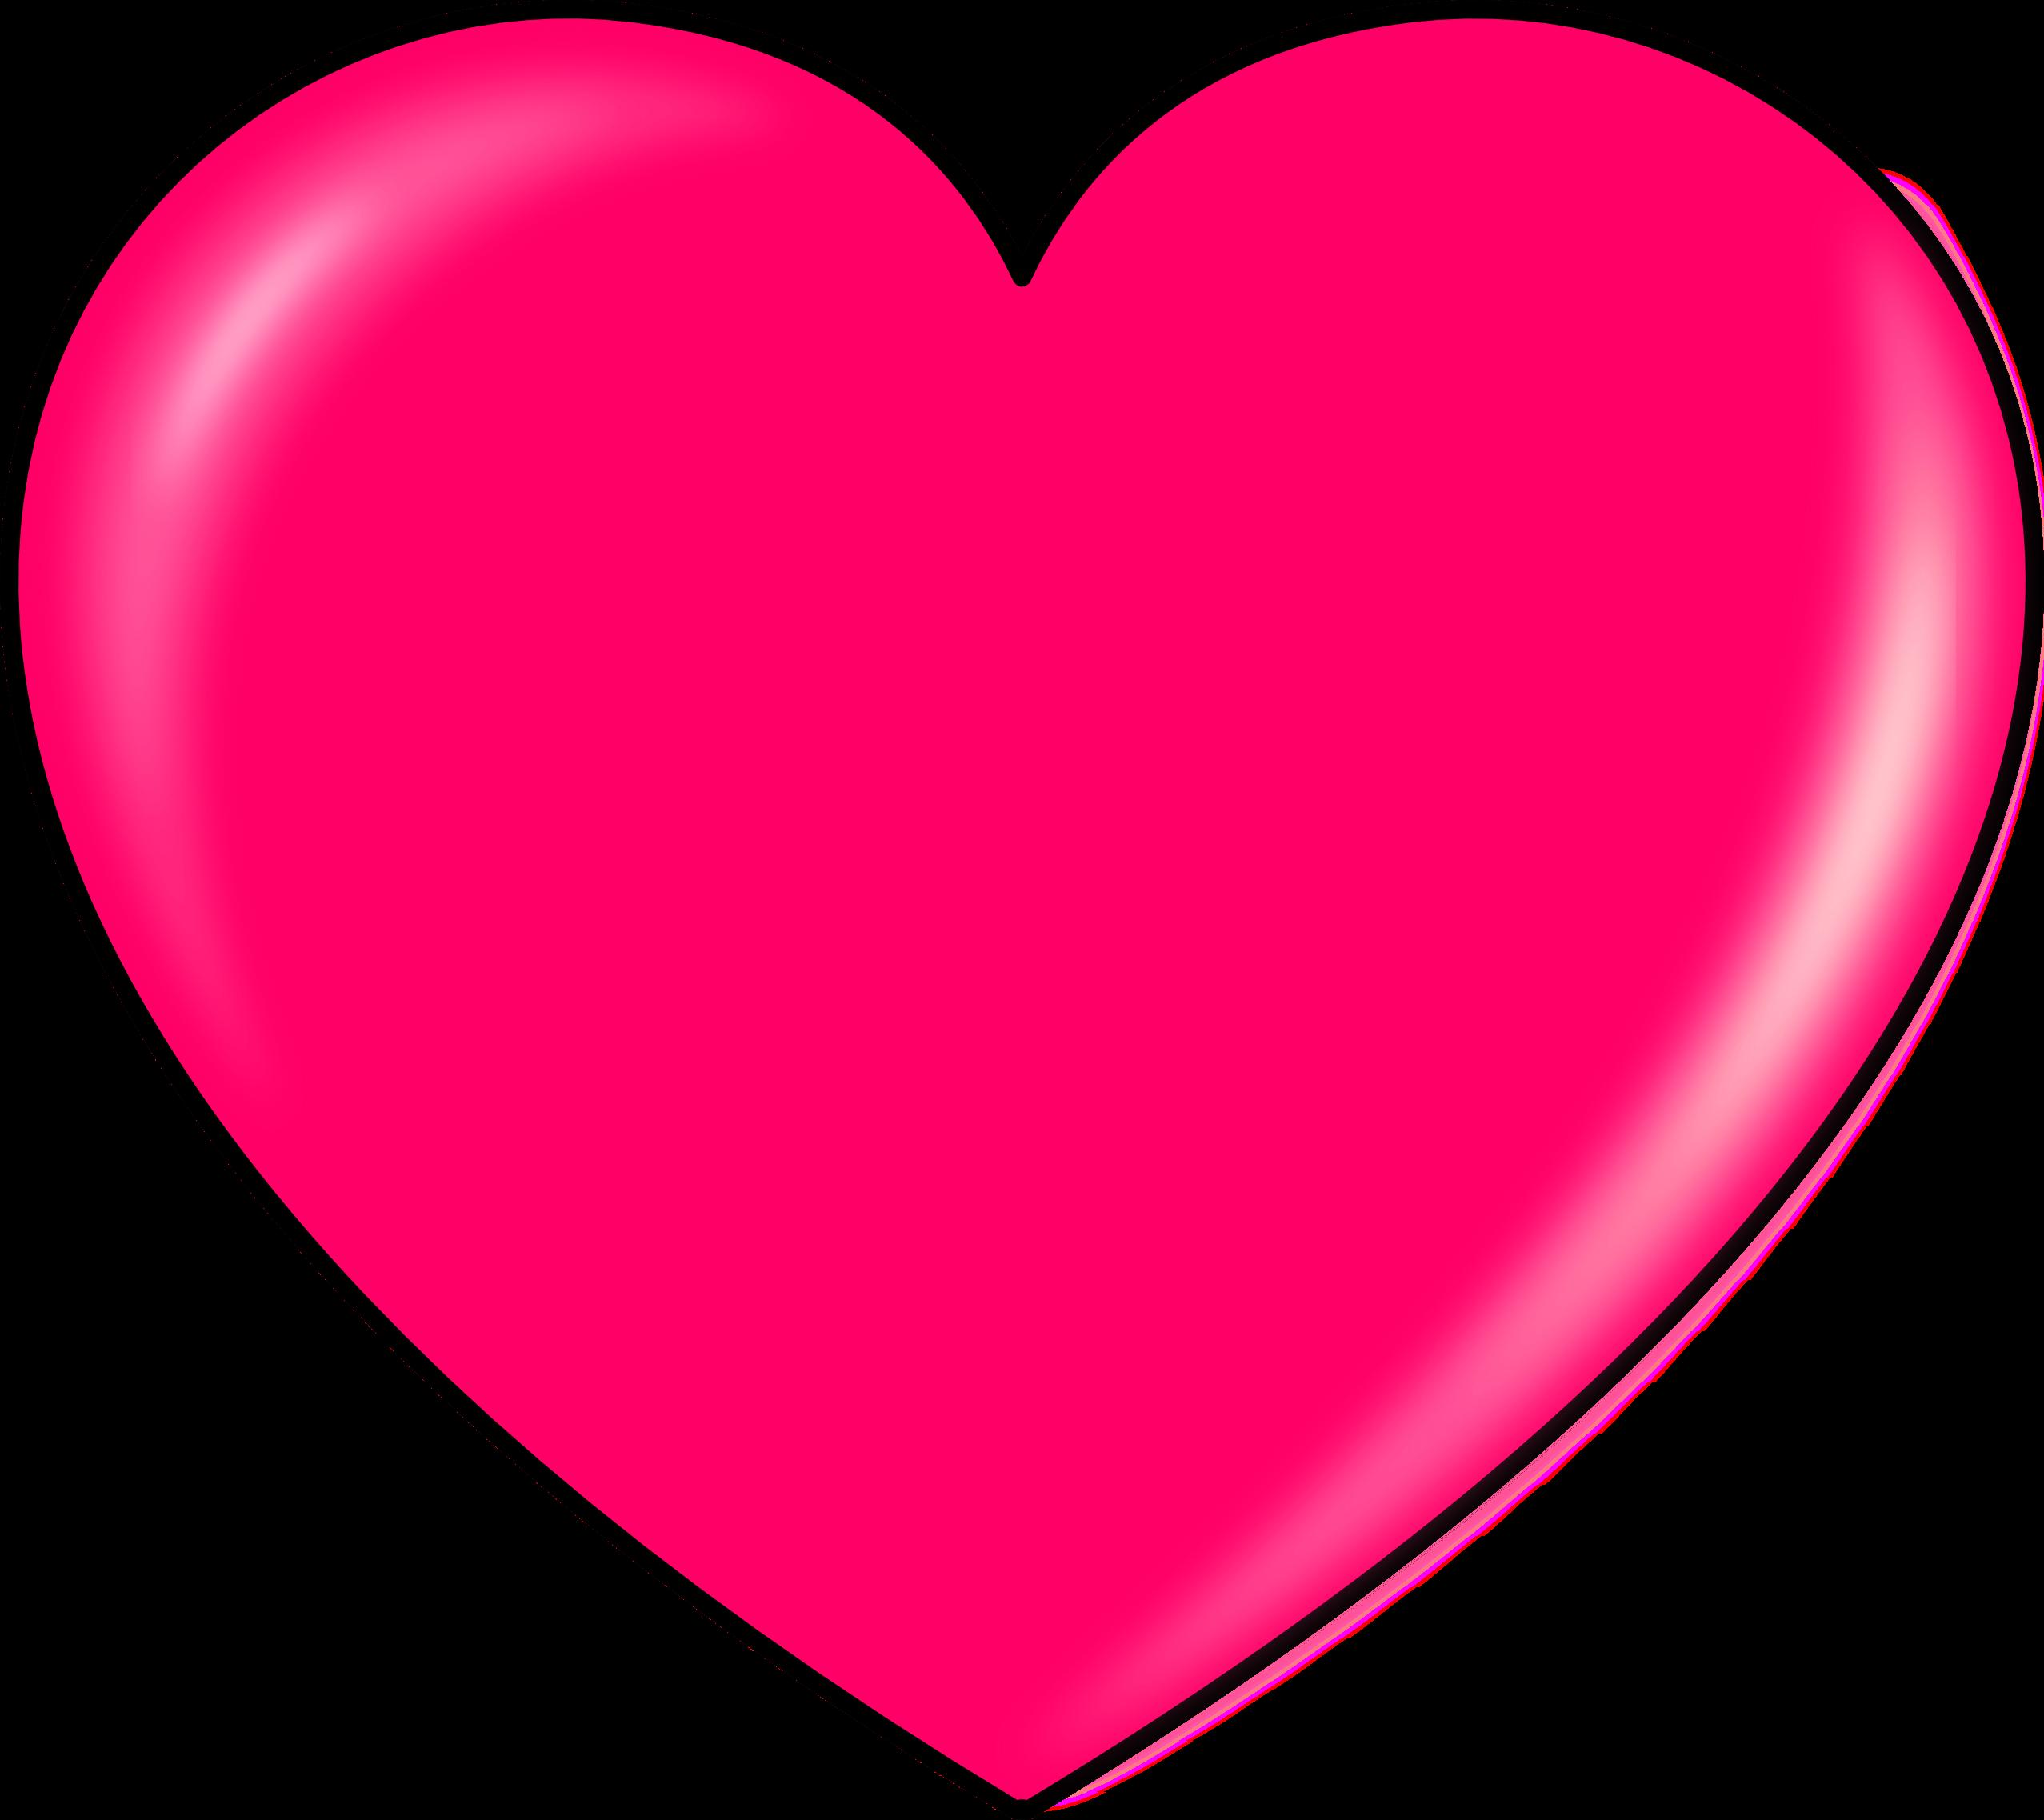 2555x2275 Pink Heart Clipart Transparent Png